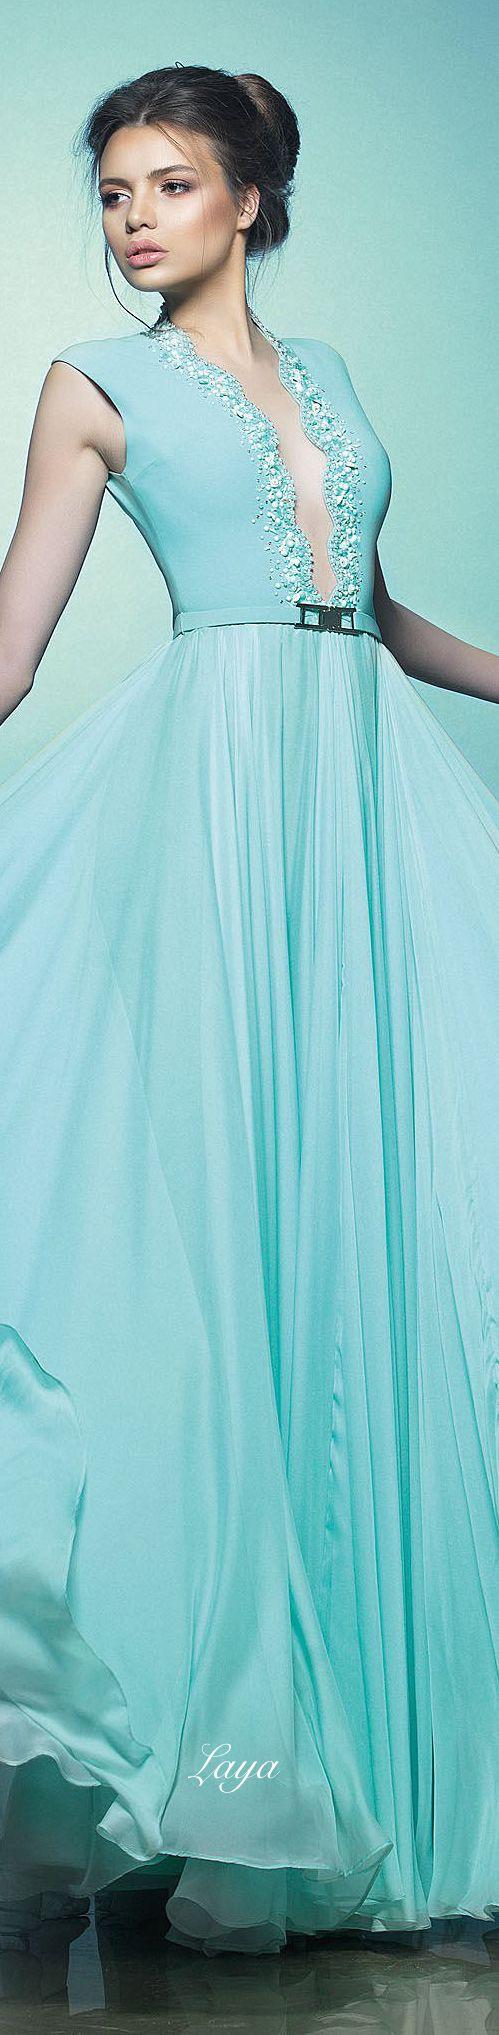 SAIID KOBEISY Spring-Summer 2015 RTW